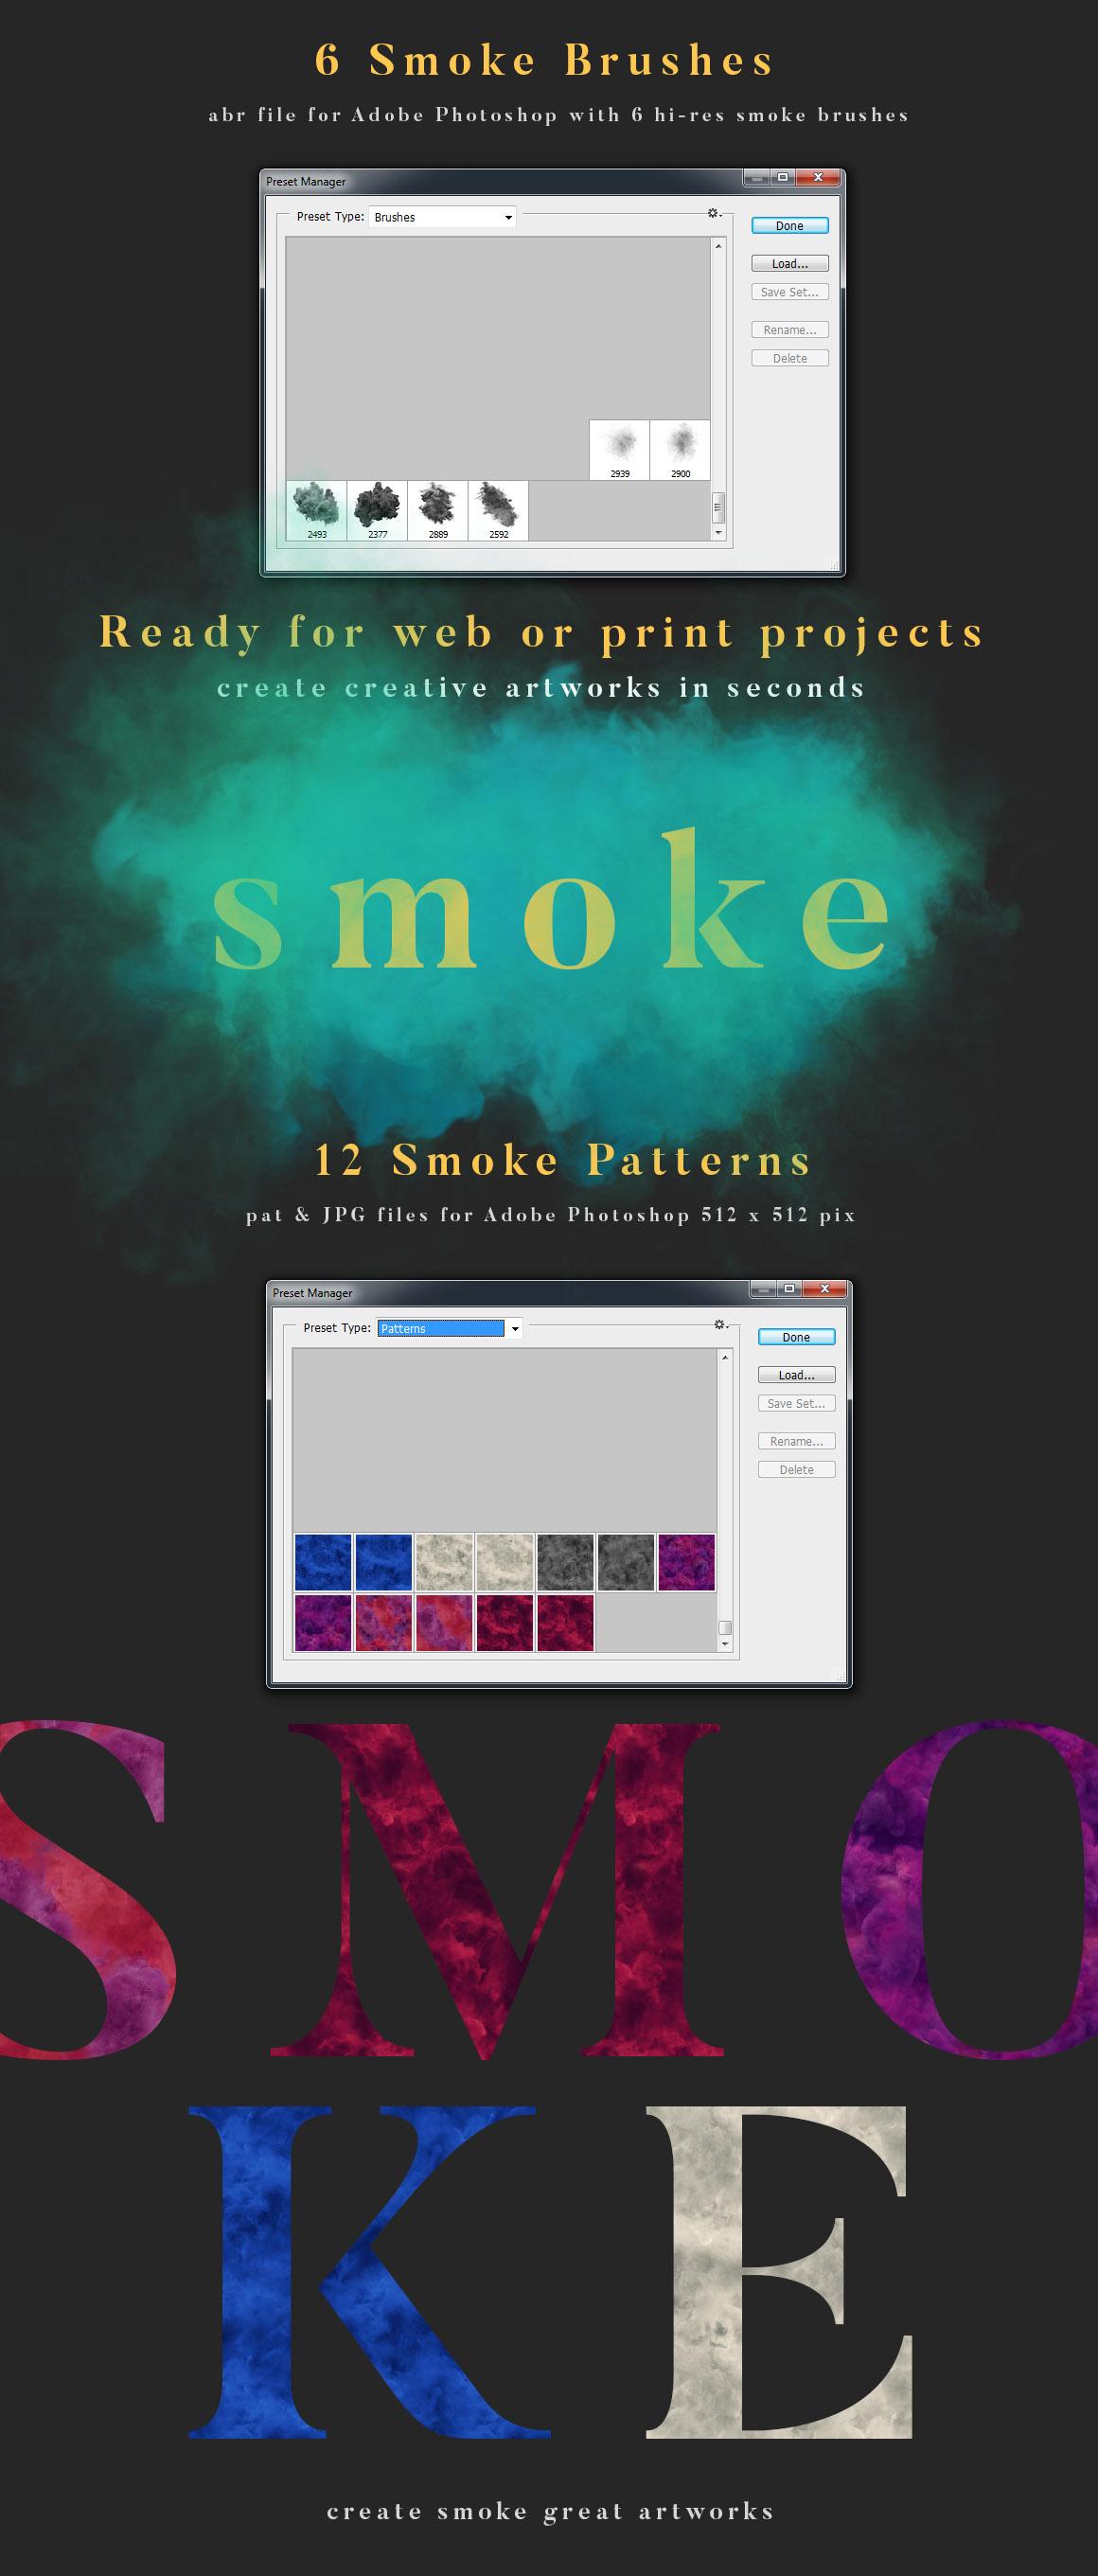 Smoke-Toolkit-2-Free-Deeezy-04